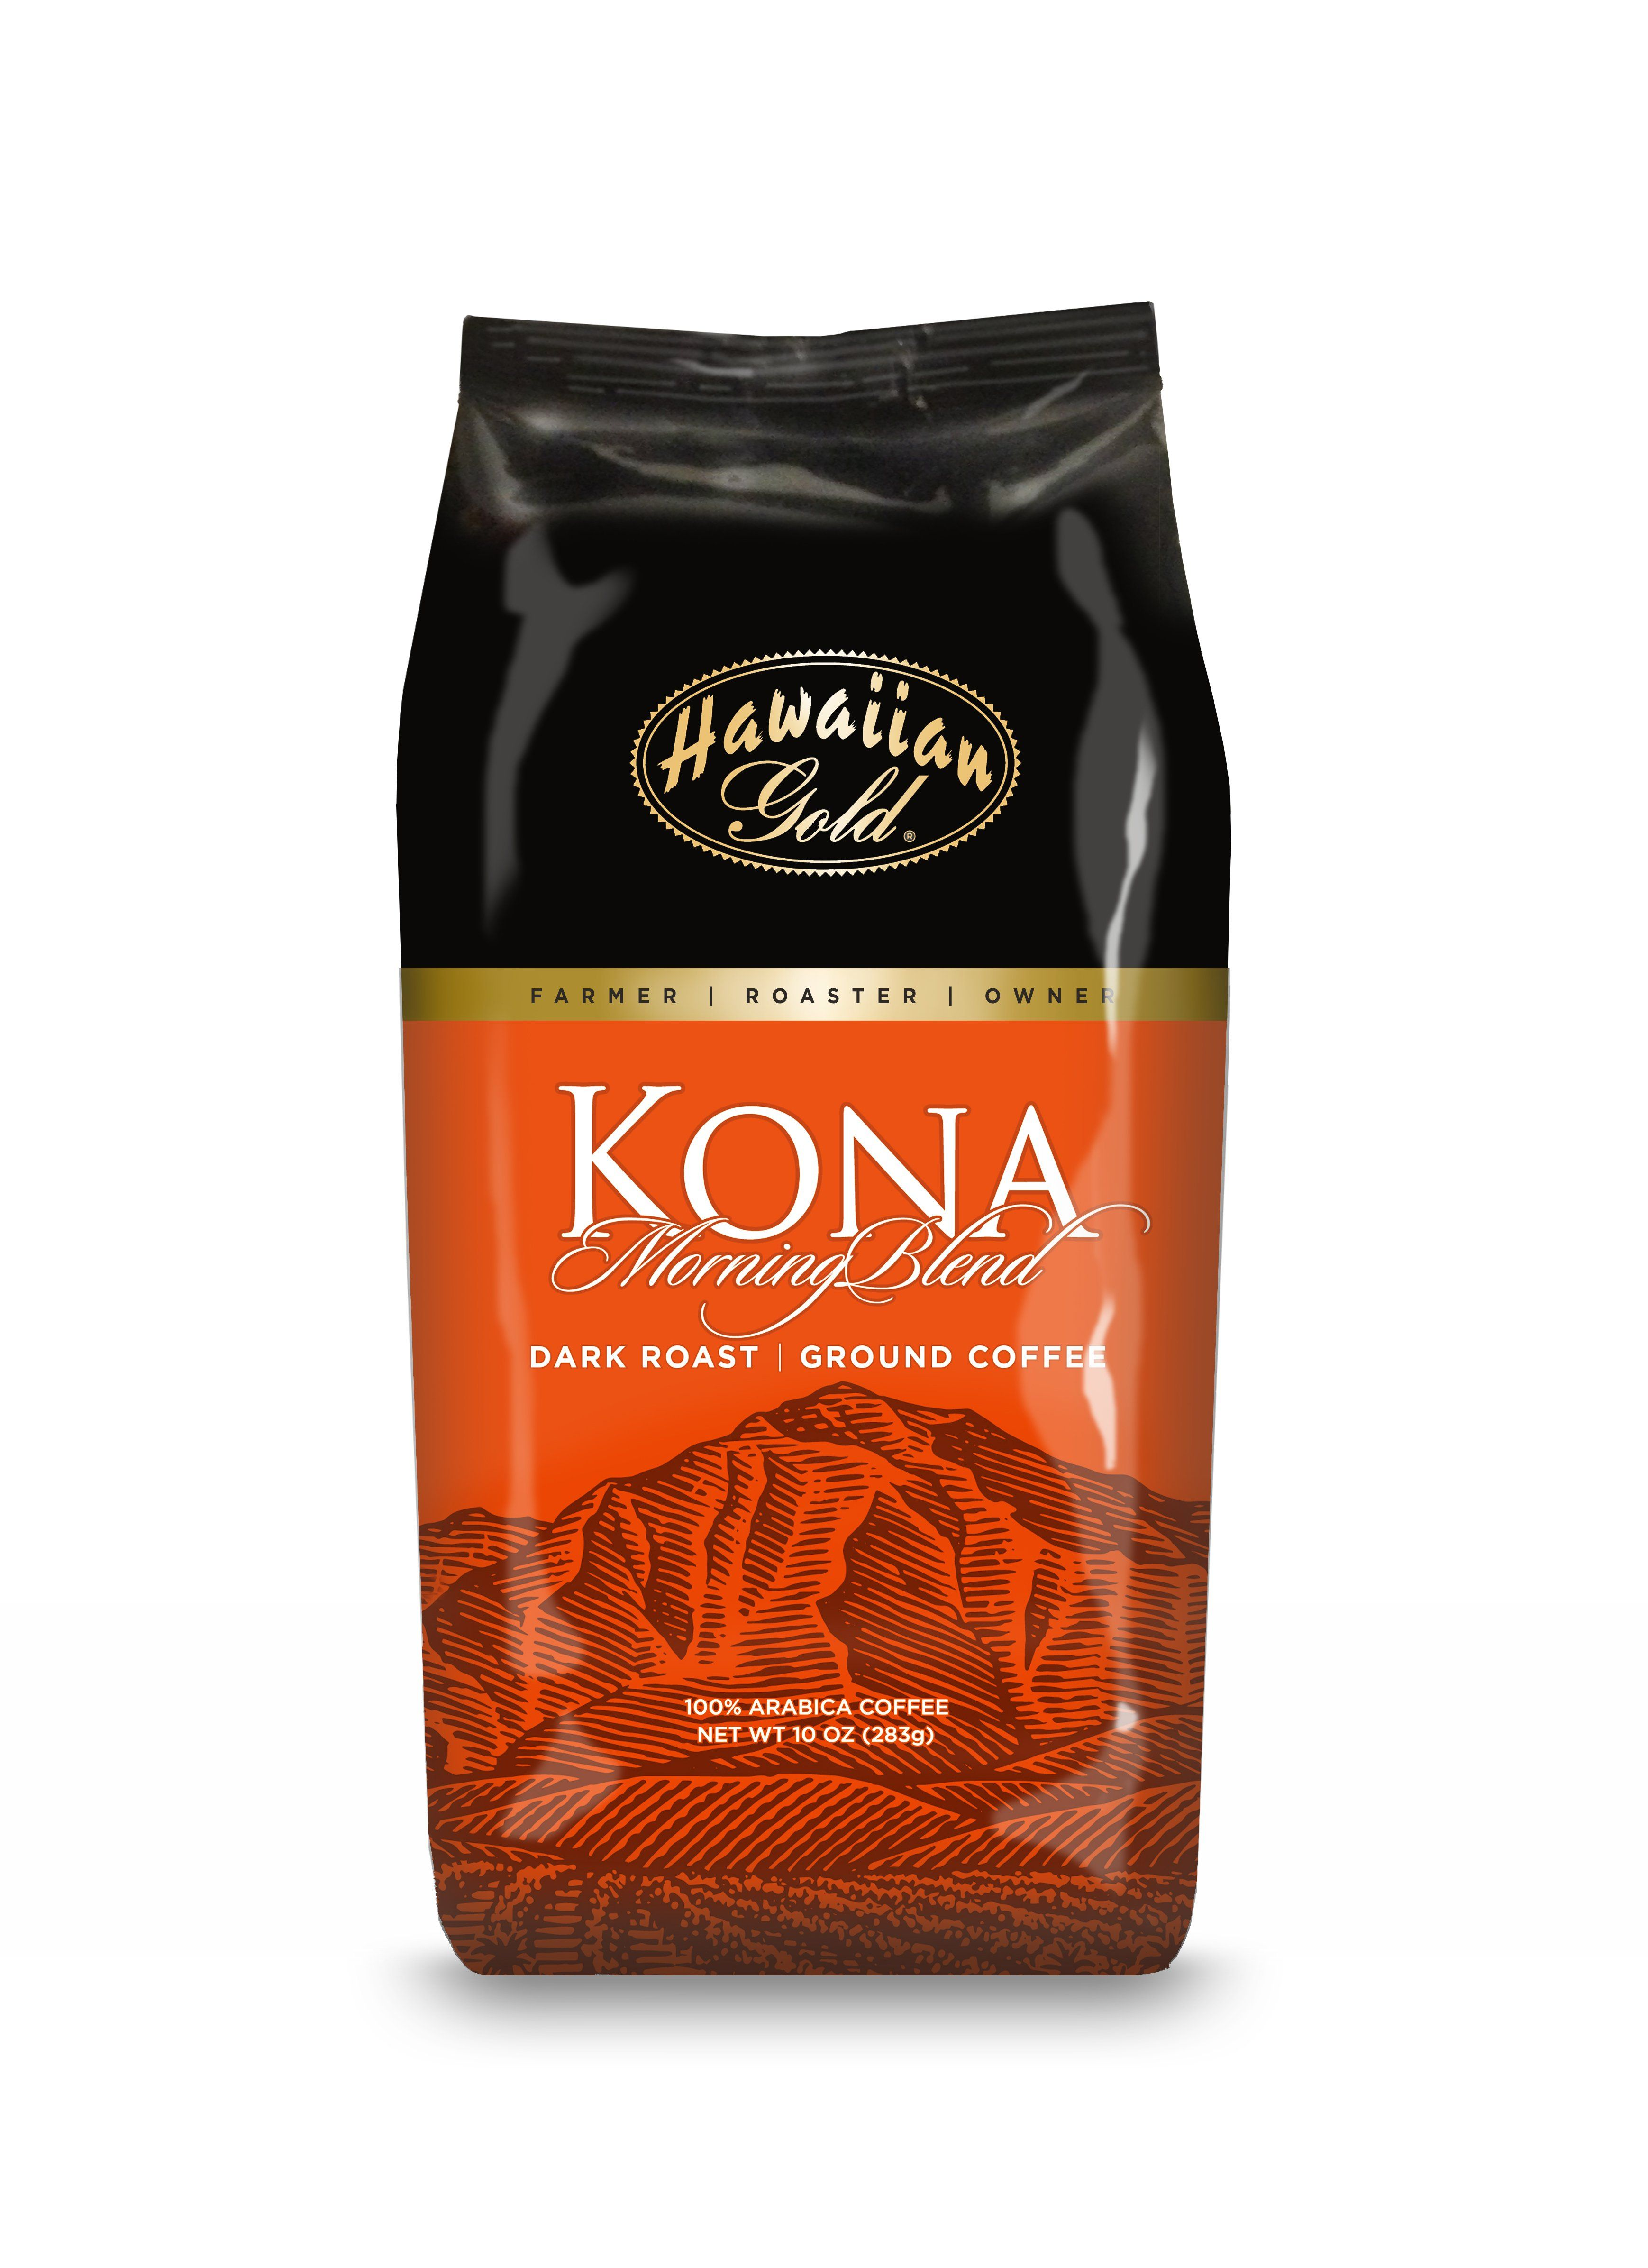 Hawaiian gold kona coffee morning blend ground coffee 10